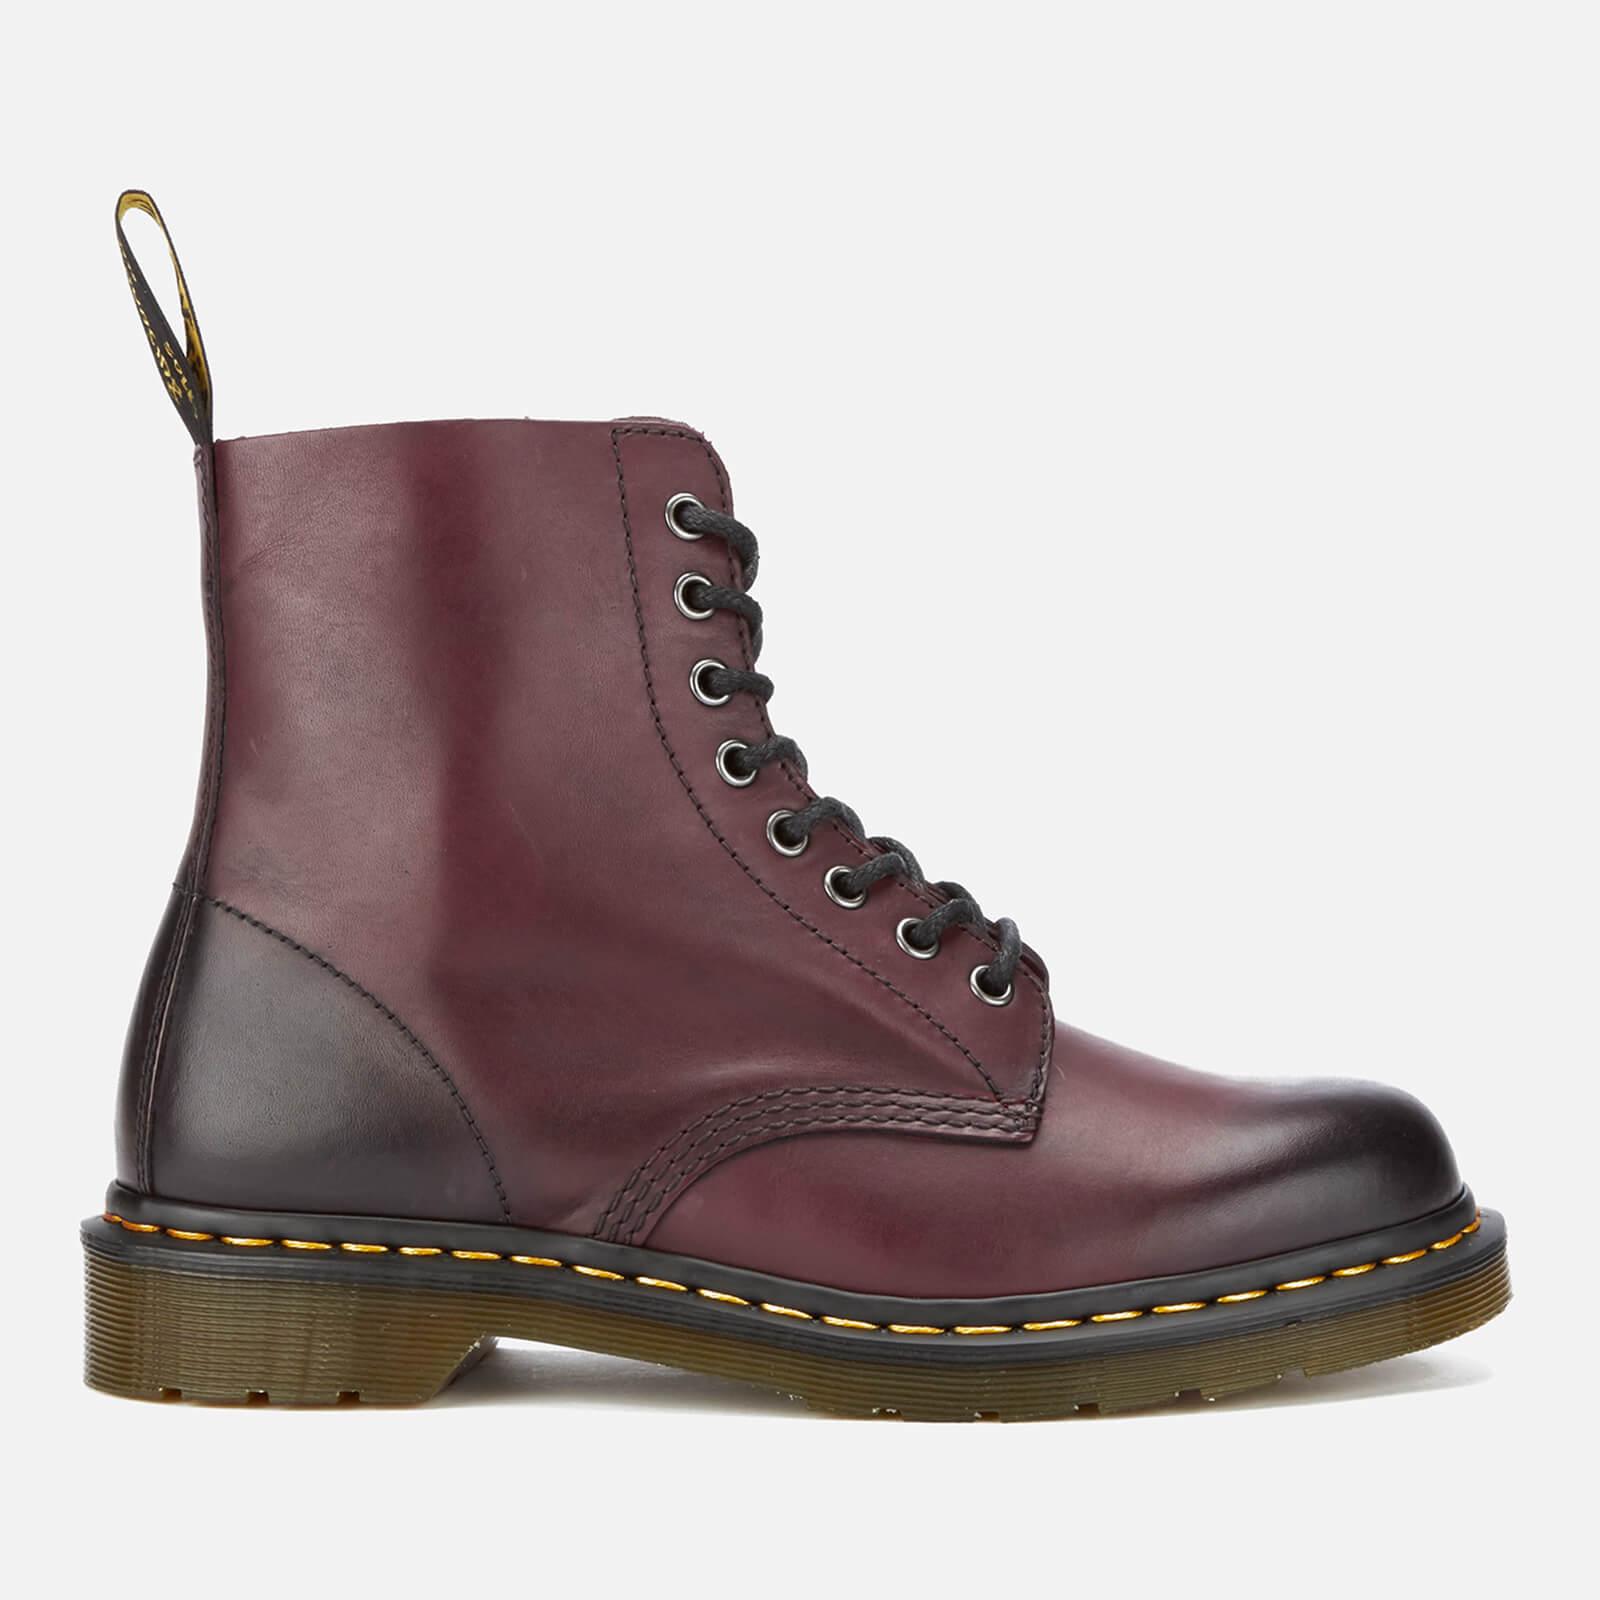 f08da6247cebb Dr. Martens Men's 1460 Pascal Antique Temperley Leather 8-Eye Boots - Cherry  Red Mens Footwear | TheHut.com